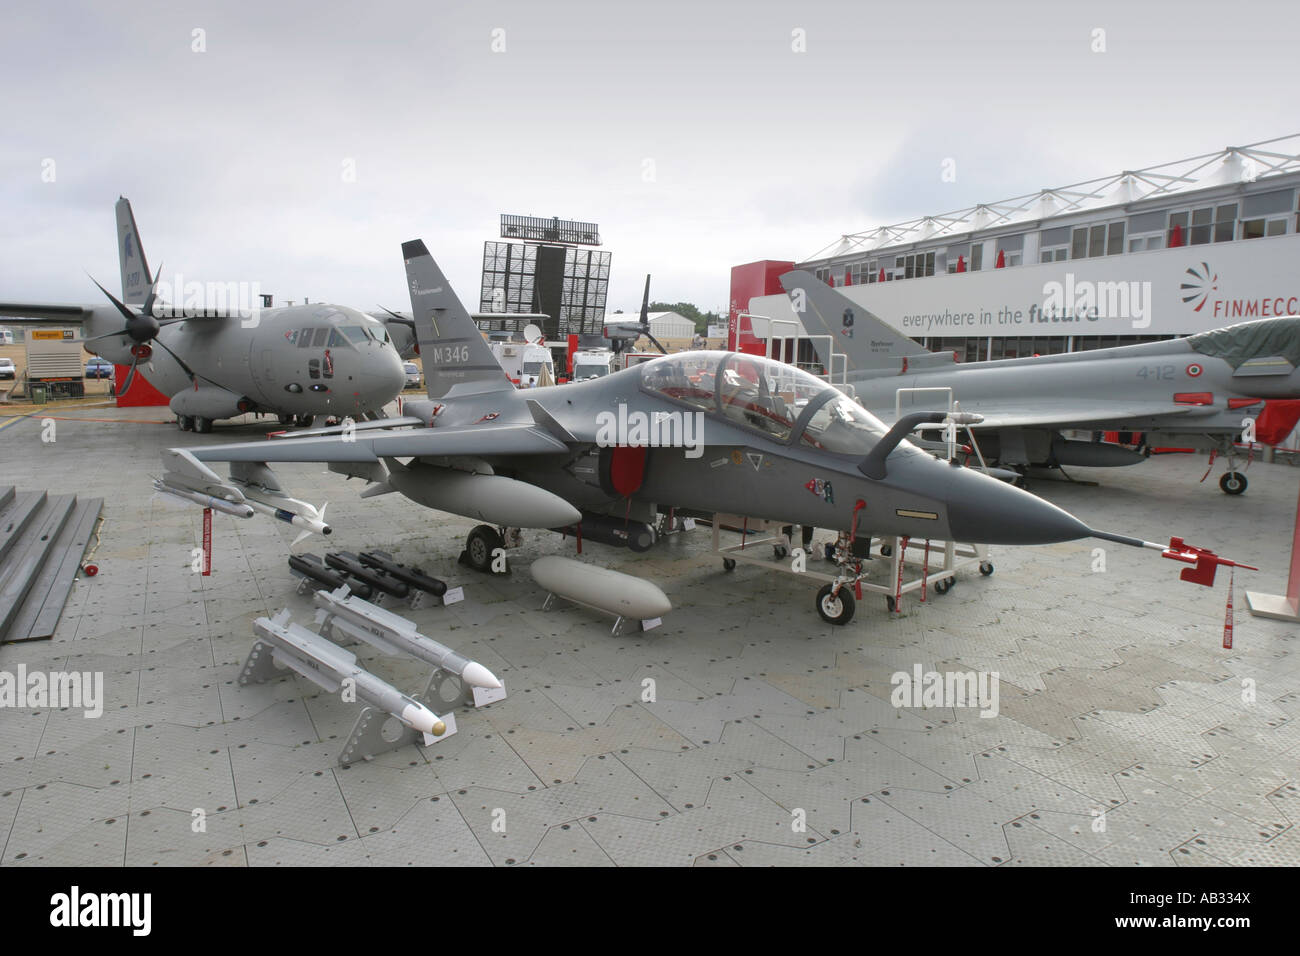 Aerchi M 346 Jet Trainer At The Static Display Of Italian Pany Finmeccanica Farnborough